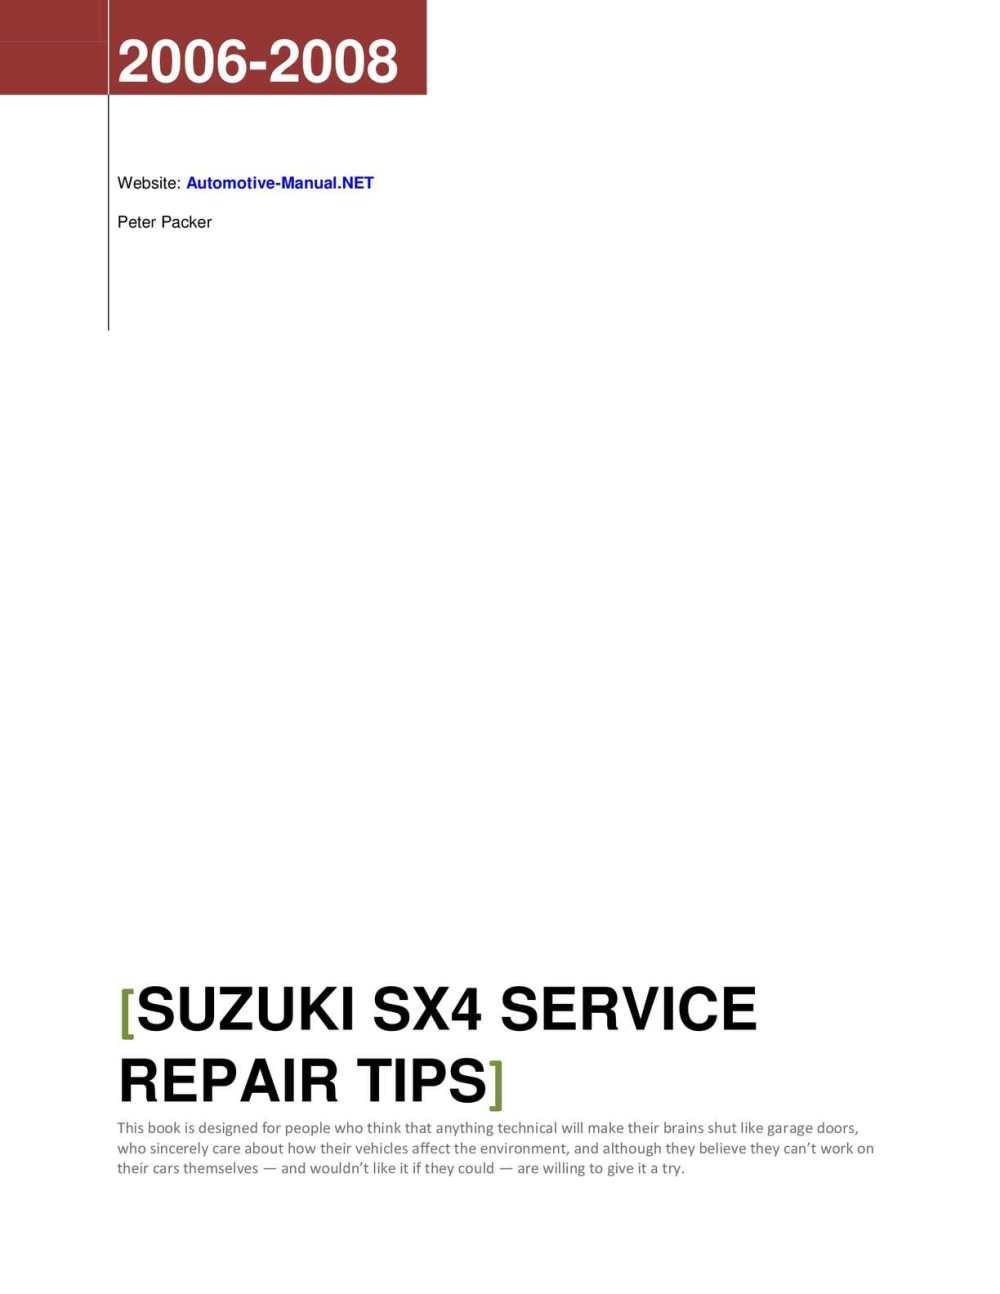 medium resolution of suzuki sx4 2006 2008 service repair tips